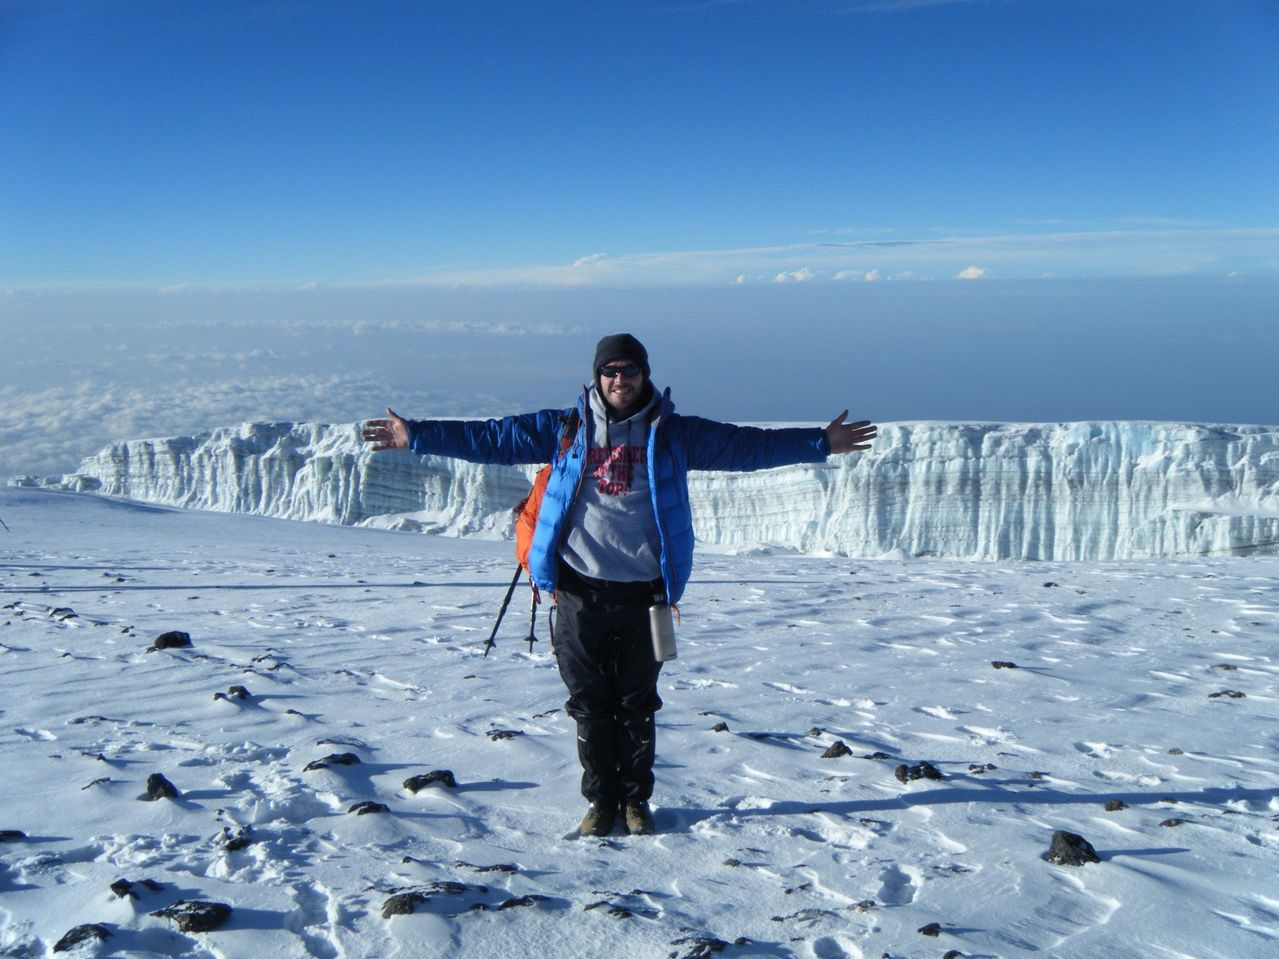 Trevisker_Kilimanjaro_climb_2